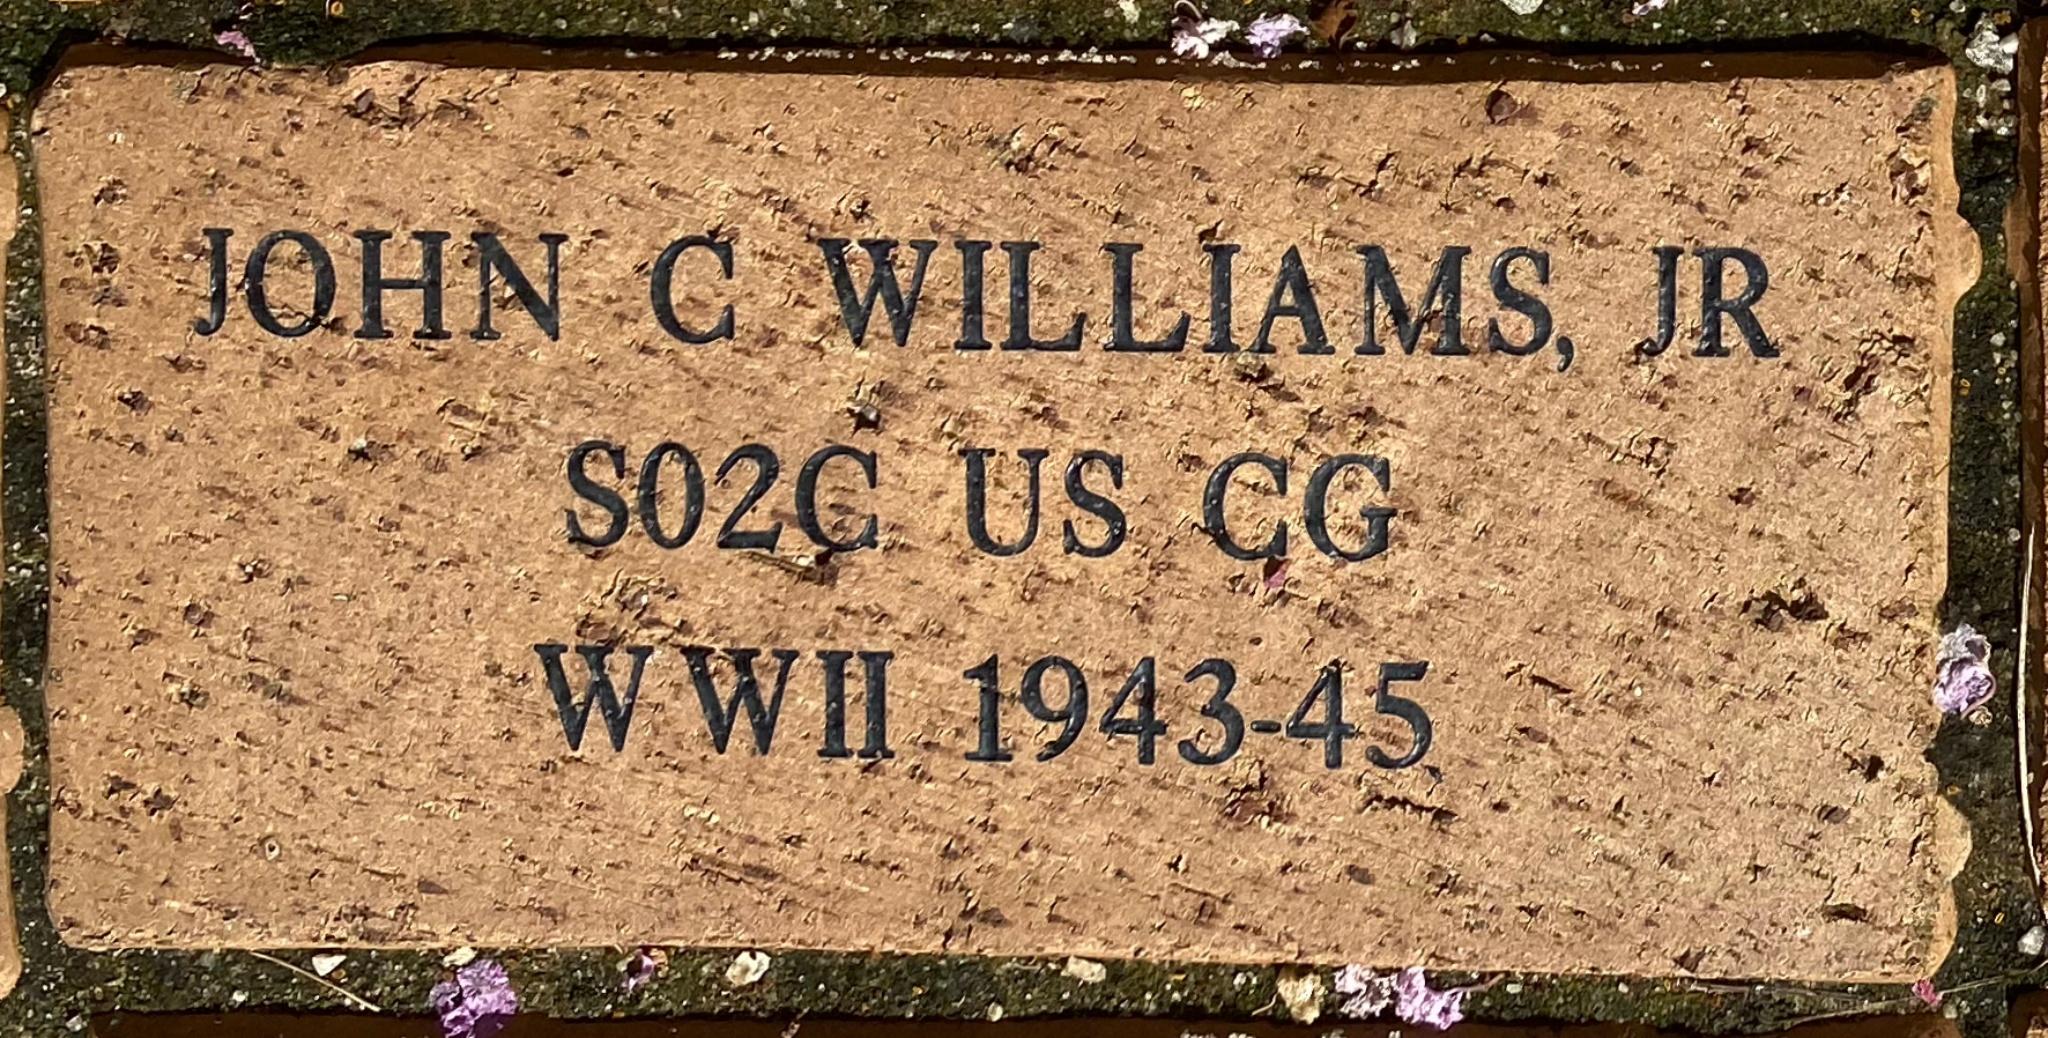 JOHN C WILLIAMS, JR S02C US CG WWII 1943-45